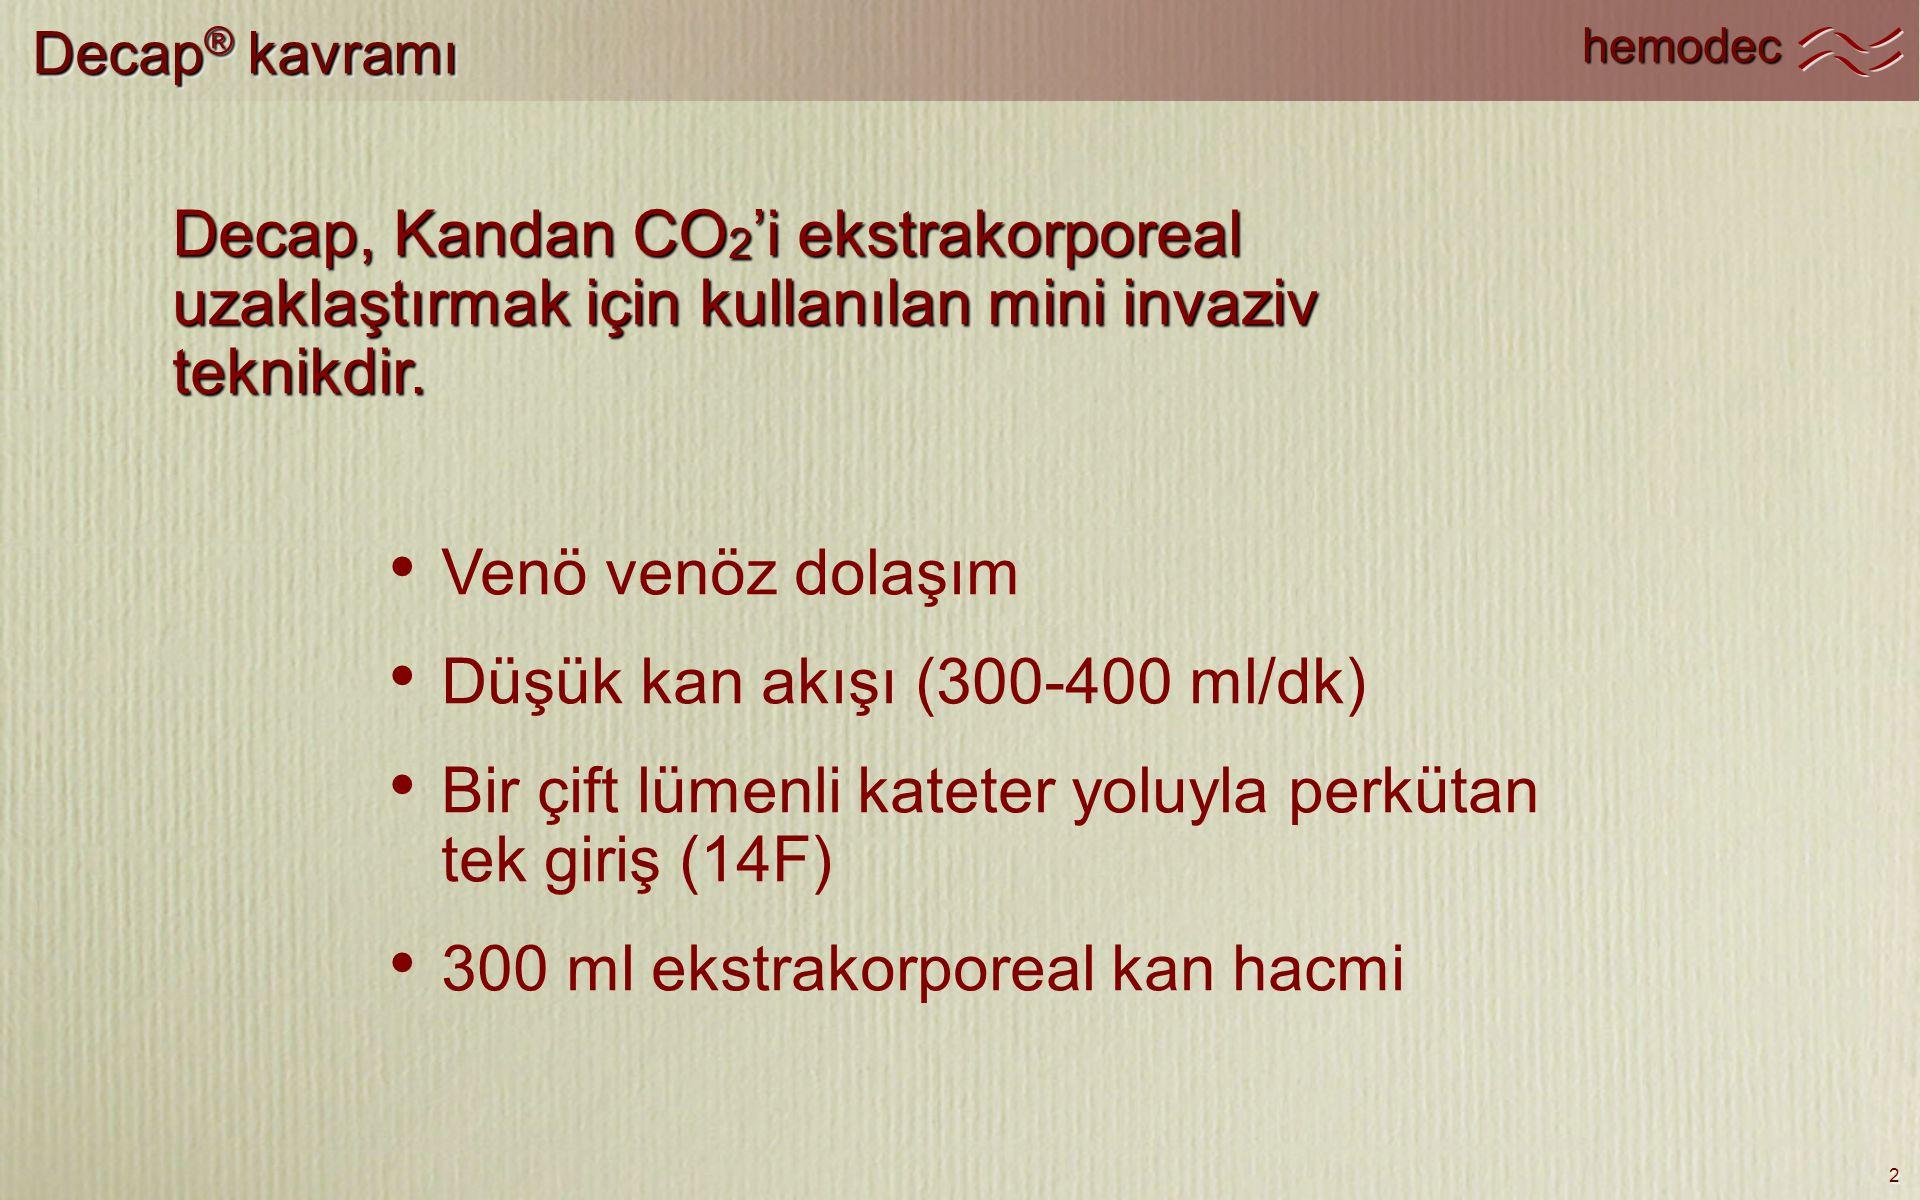 Düşük kan akışı (300-400 ml/dk)